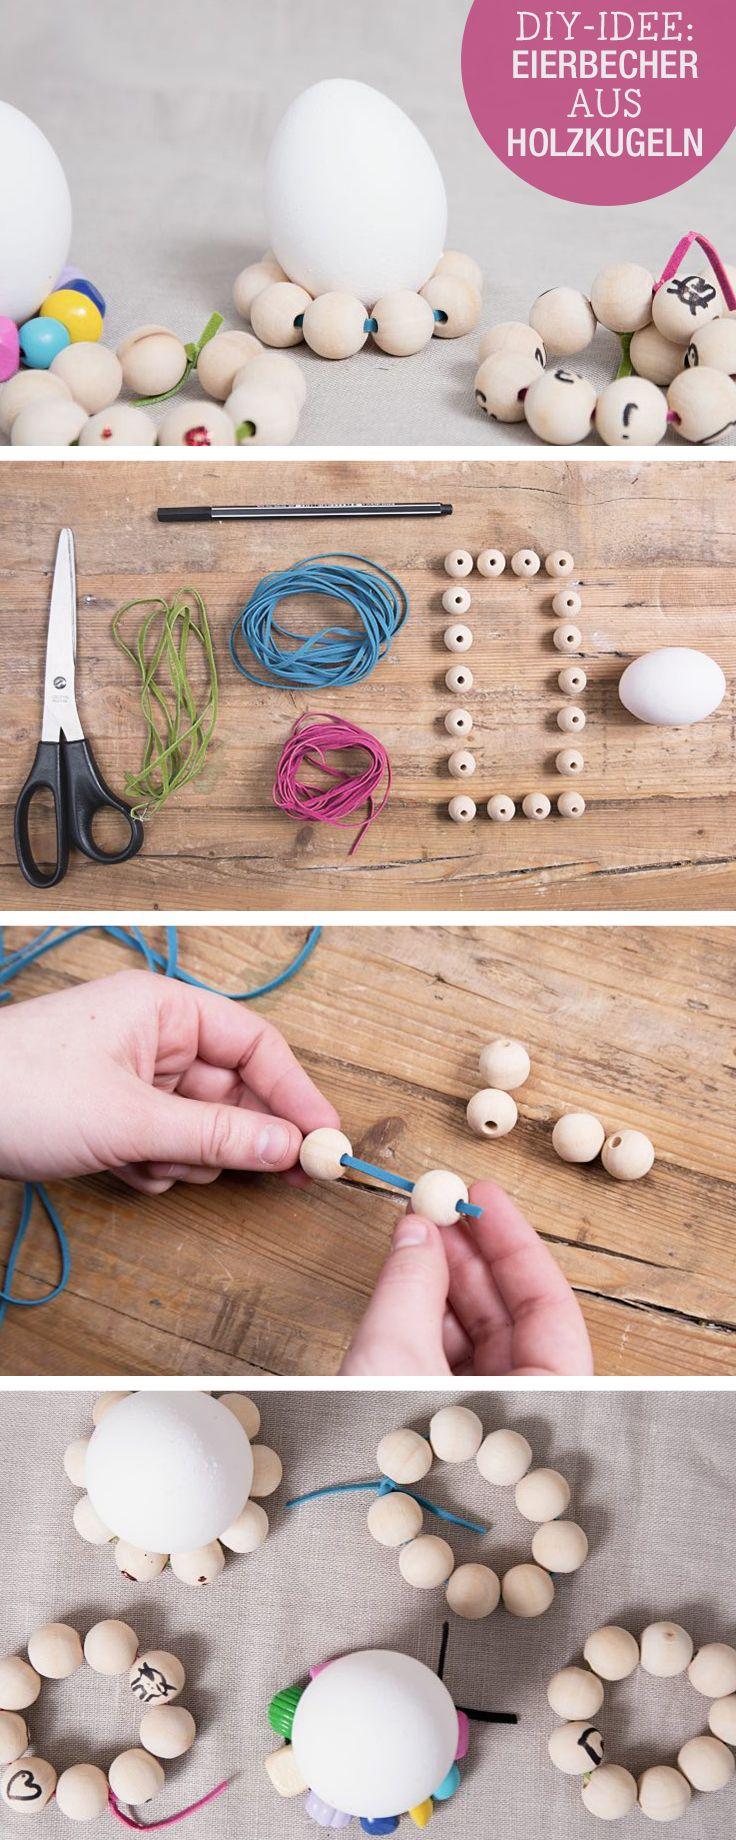 DIY-Anleitung für Osterdeko: Eierhalter aus Holzkugeln selbermachen / easter diy tutorial: wooden egg holder via DaWanda.com